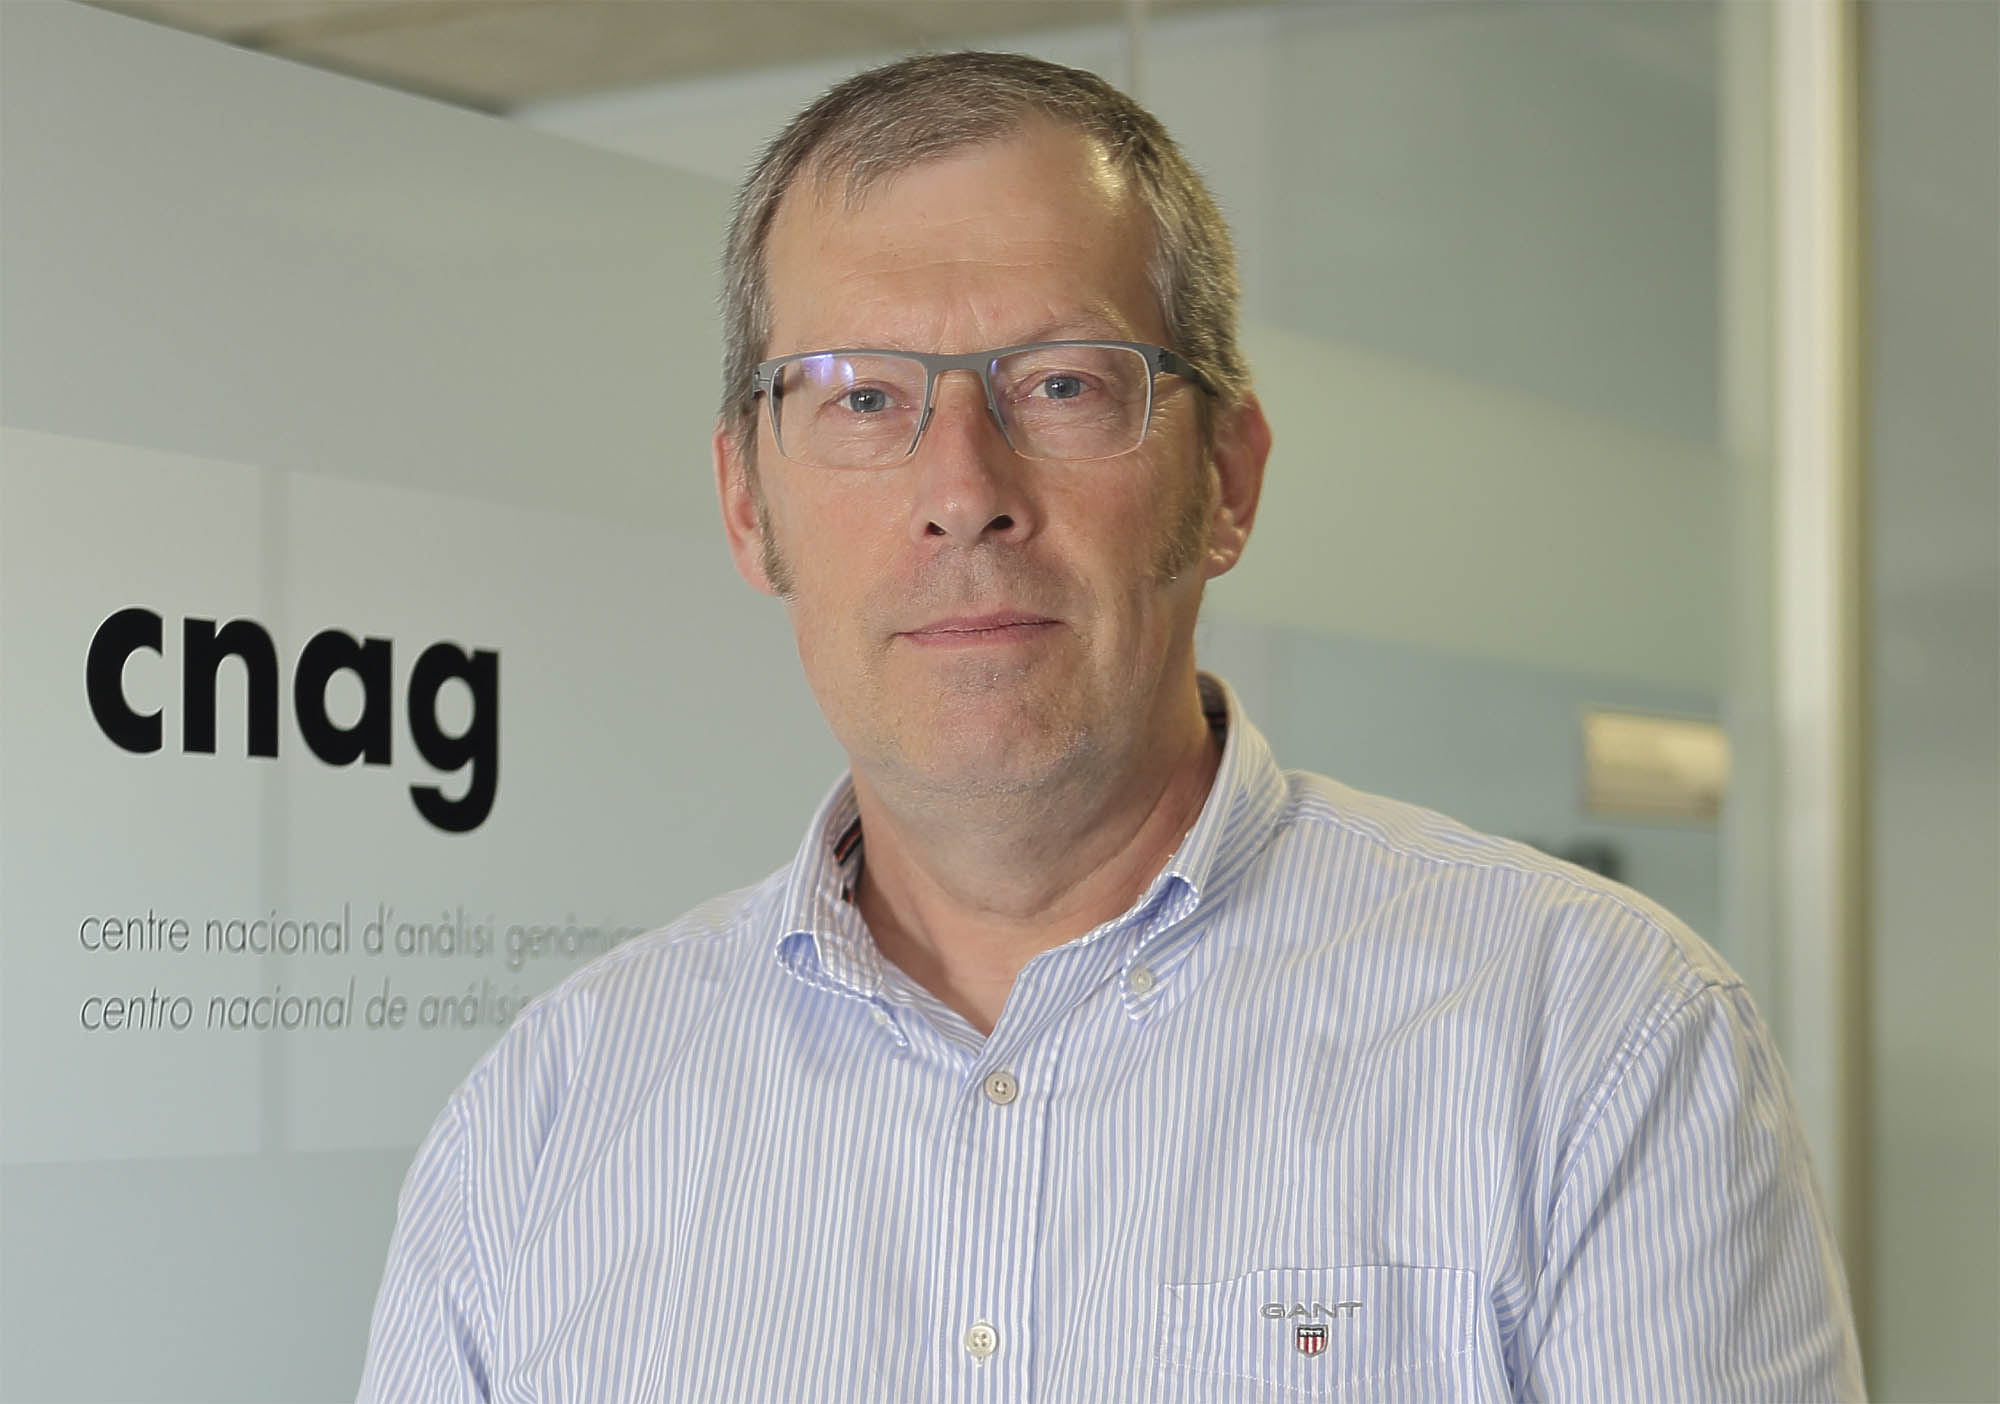 Ivo Gut, director of the CNAG-CRG